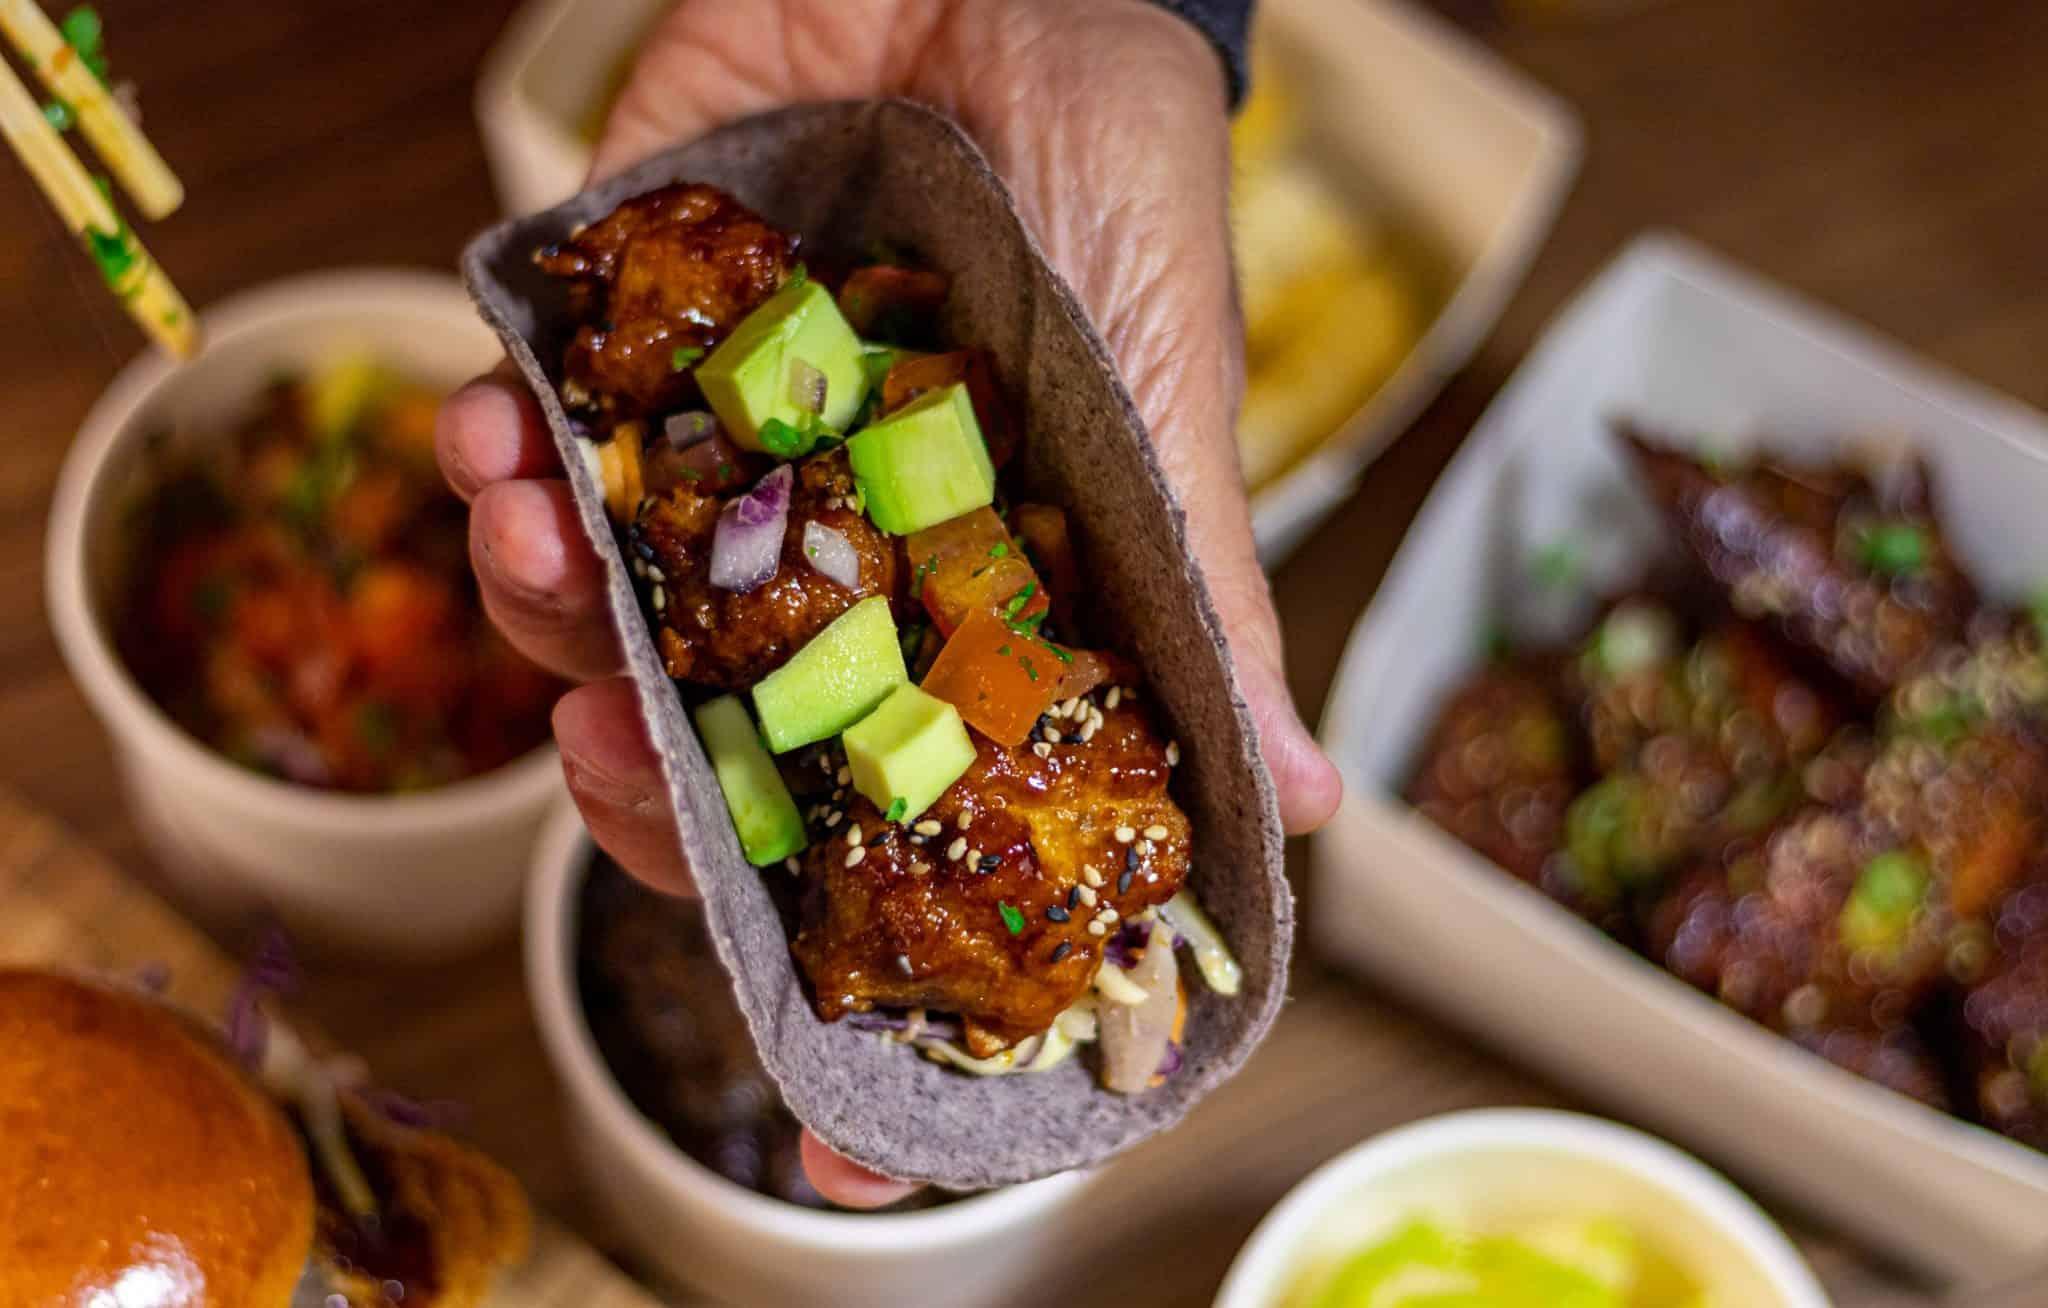 Japanified Blue Corn Taco DIY meal kits